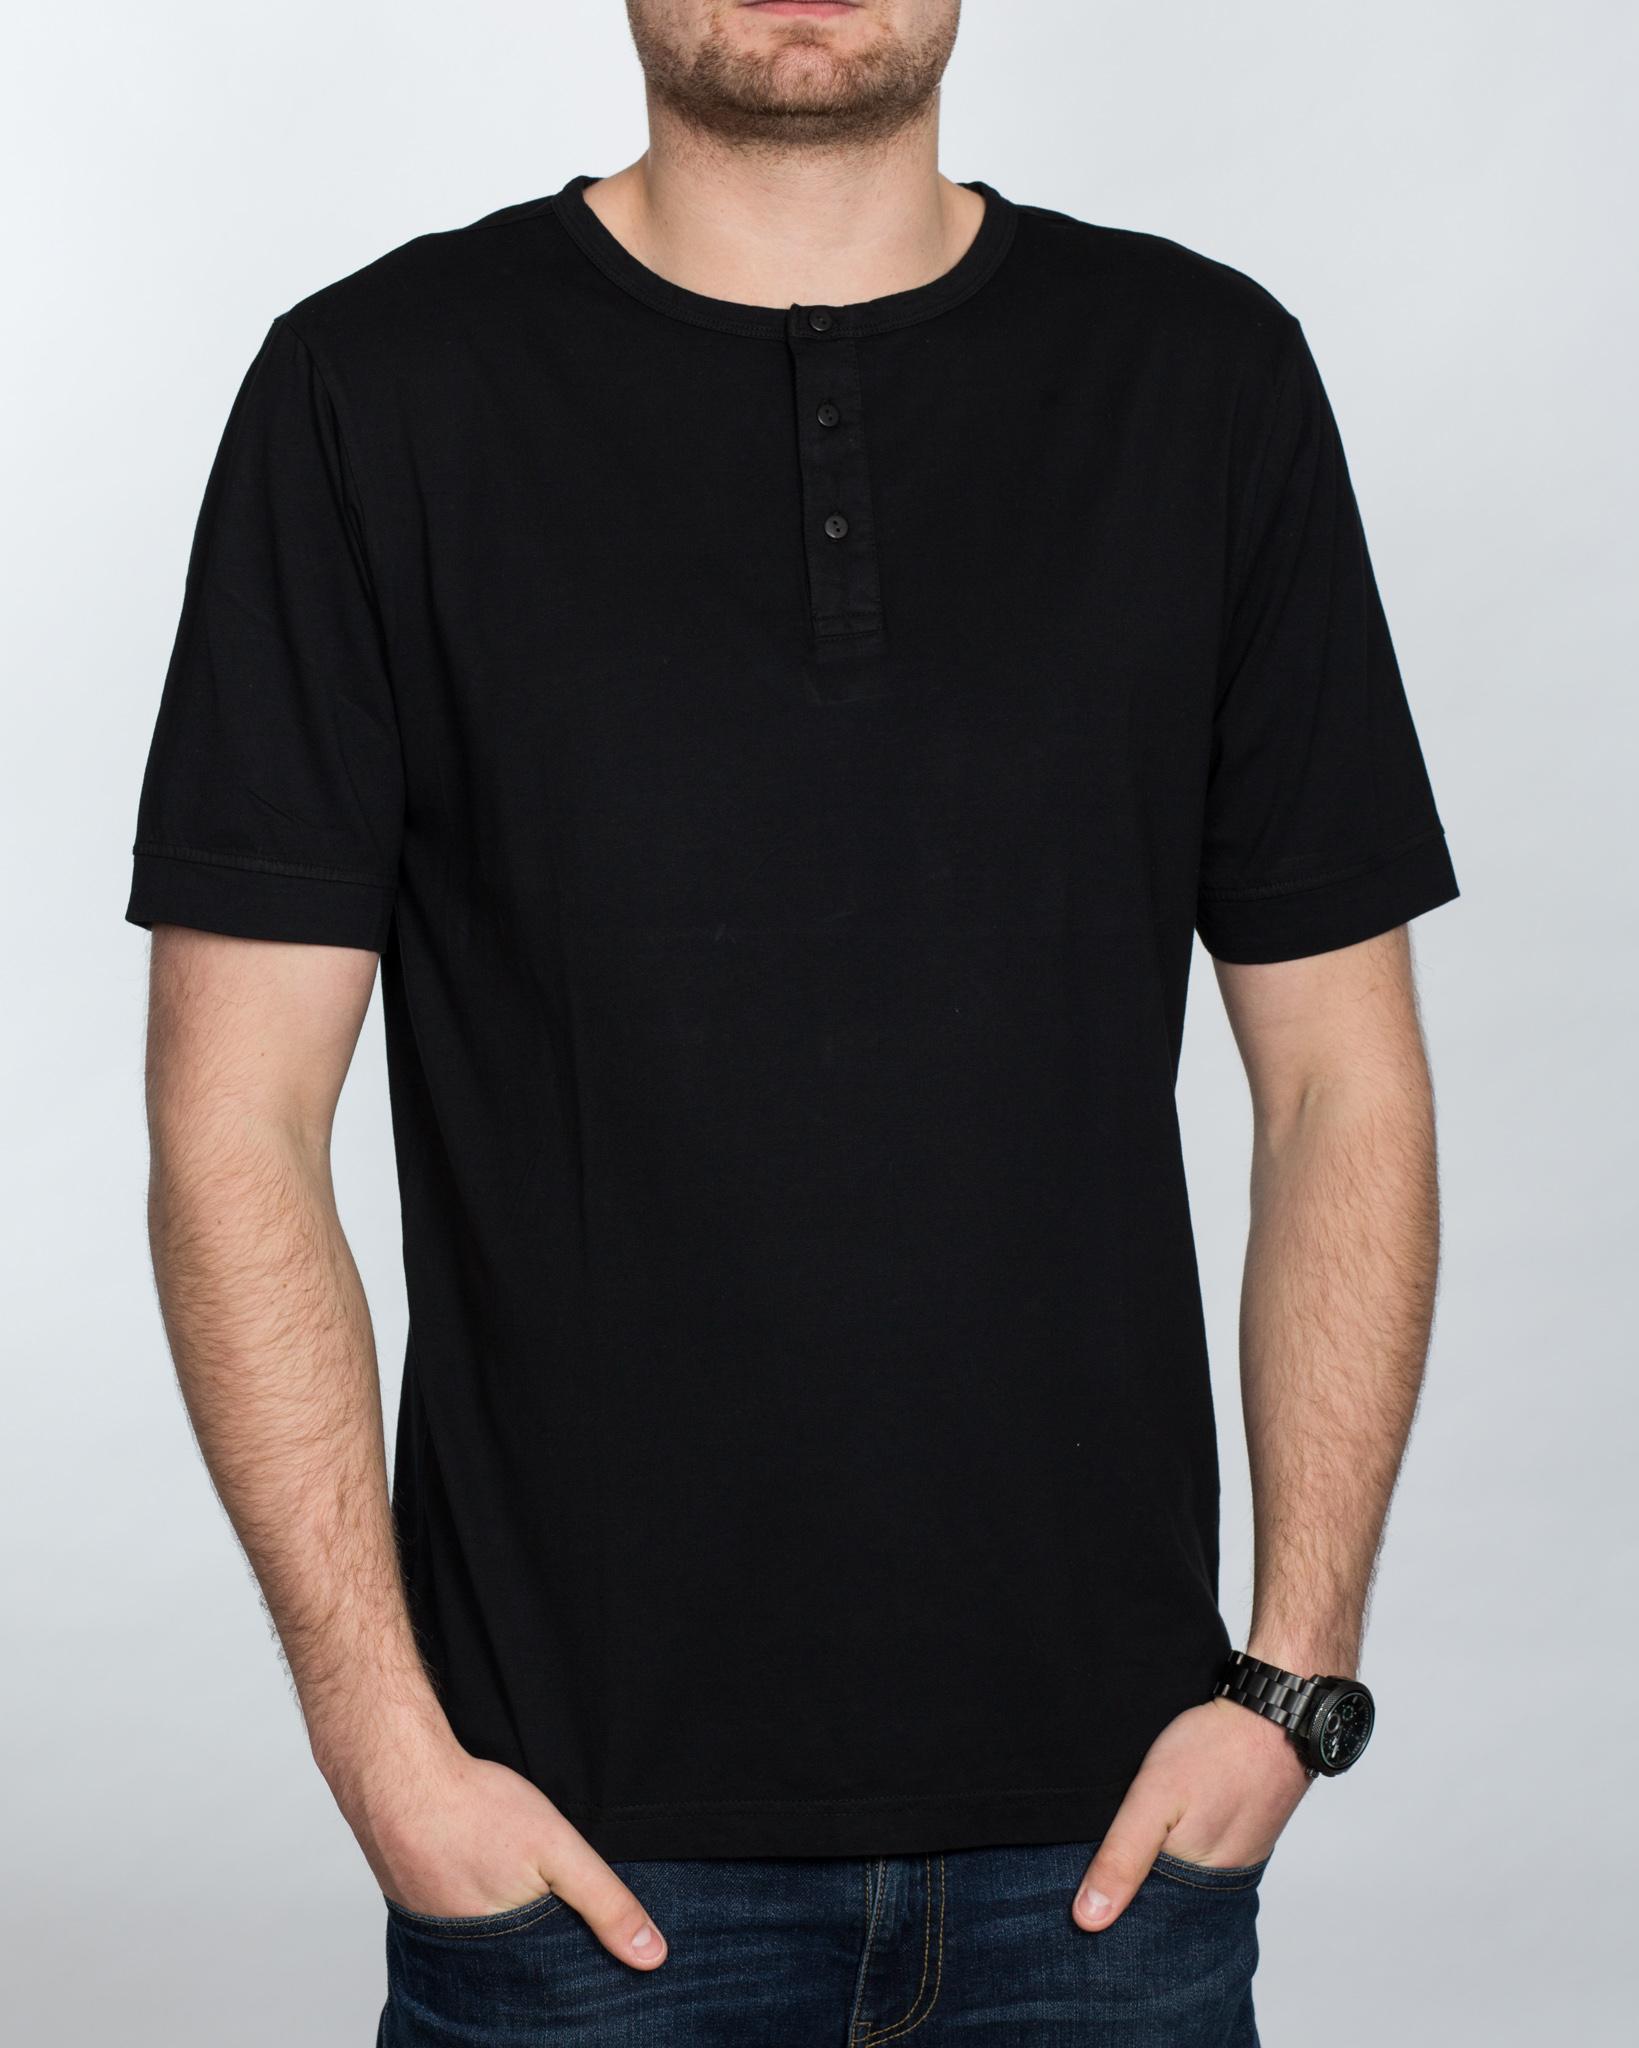 Replica Grandad Shirt (black)